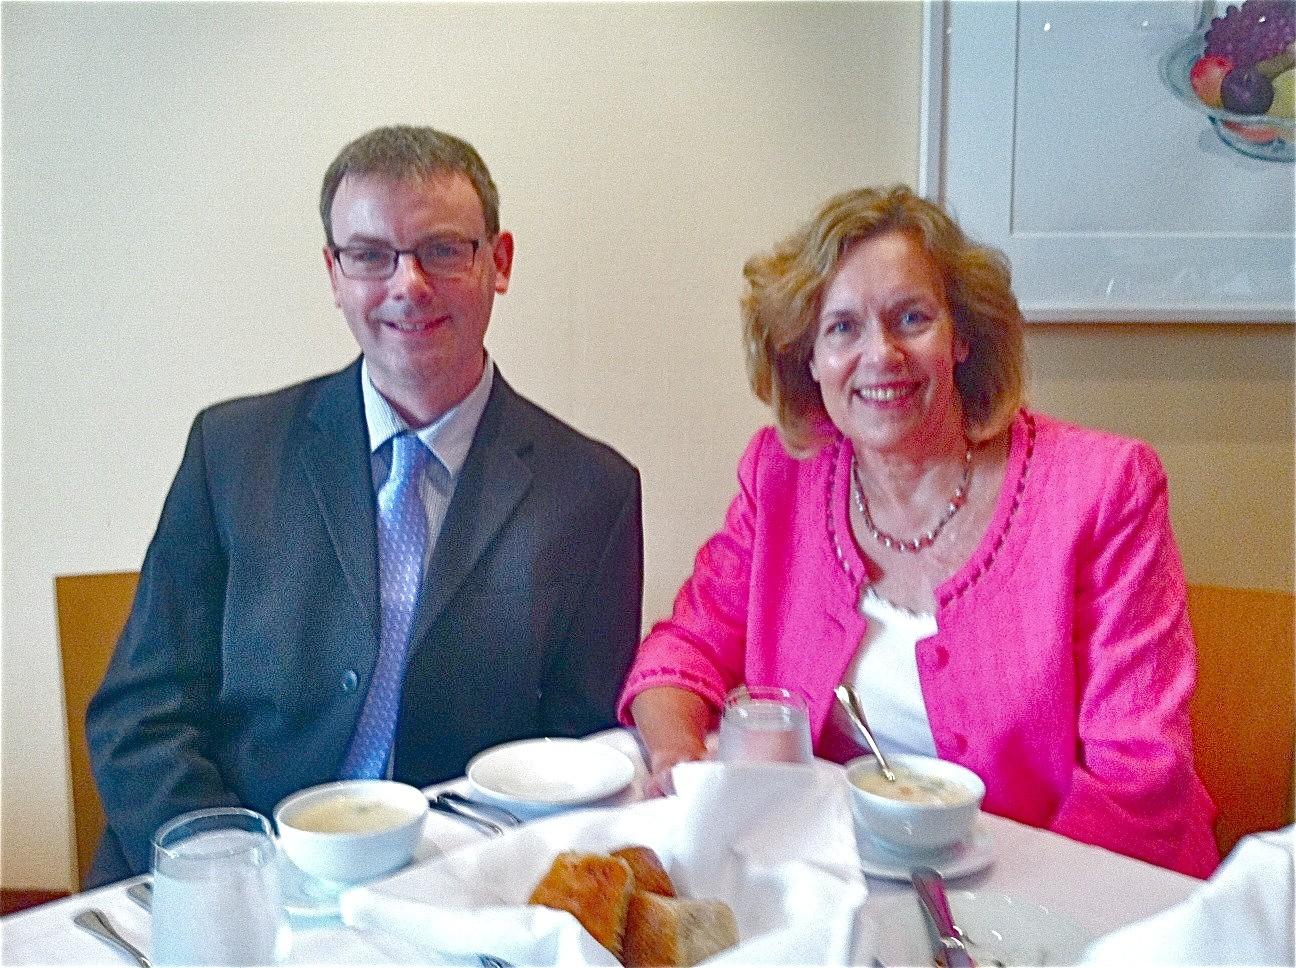 Dr. Nigel Mongan & Dr. Gudas, July, 2015 Faculty Club for lunch!